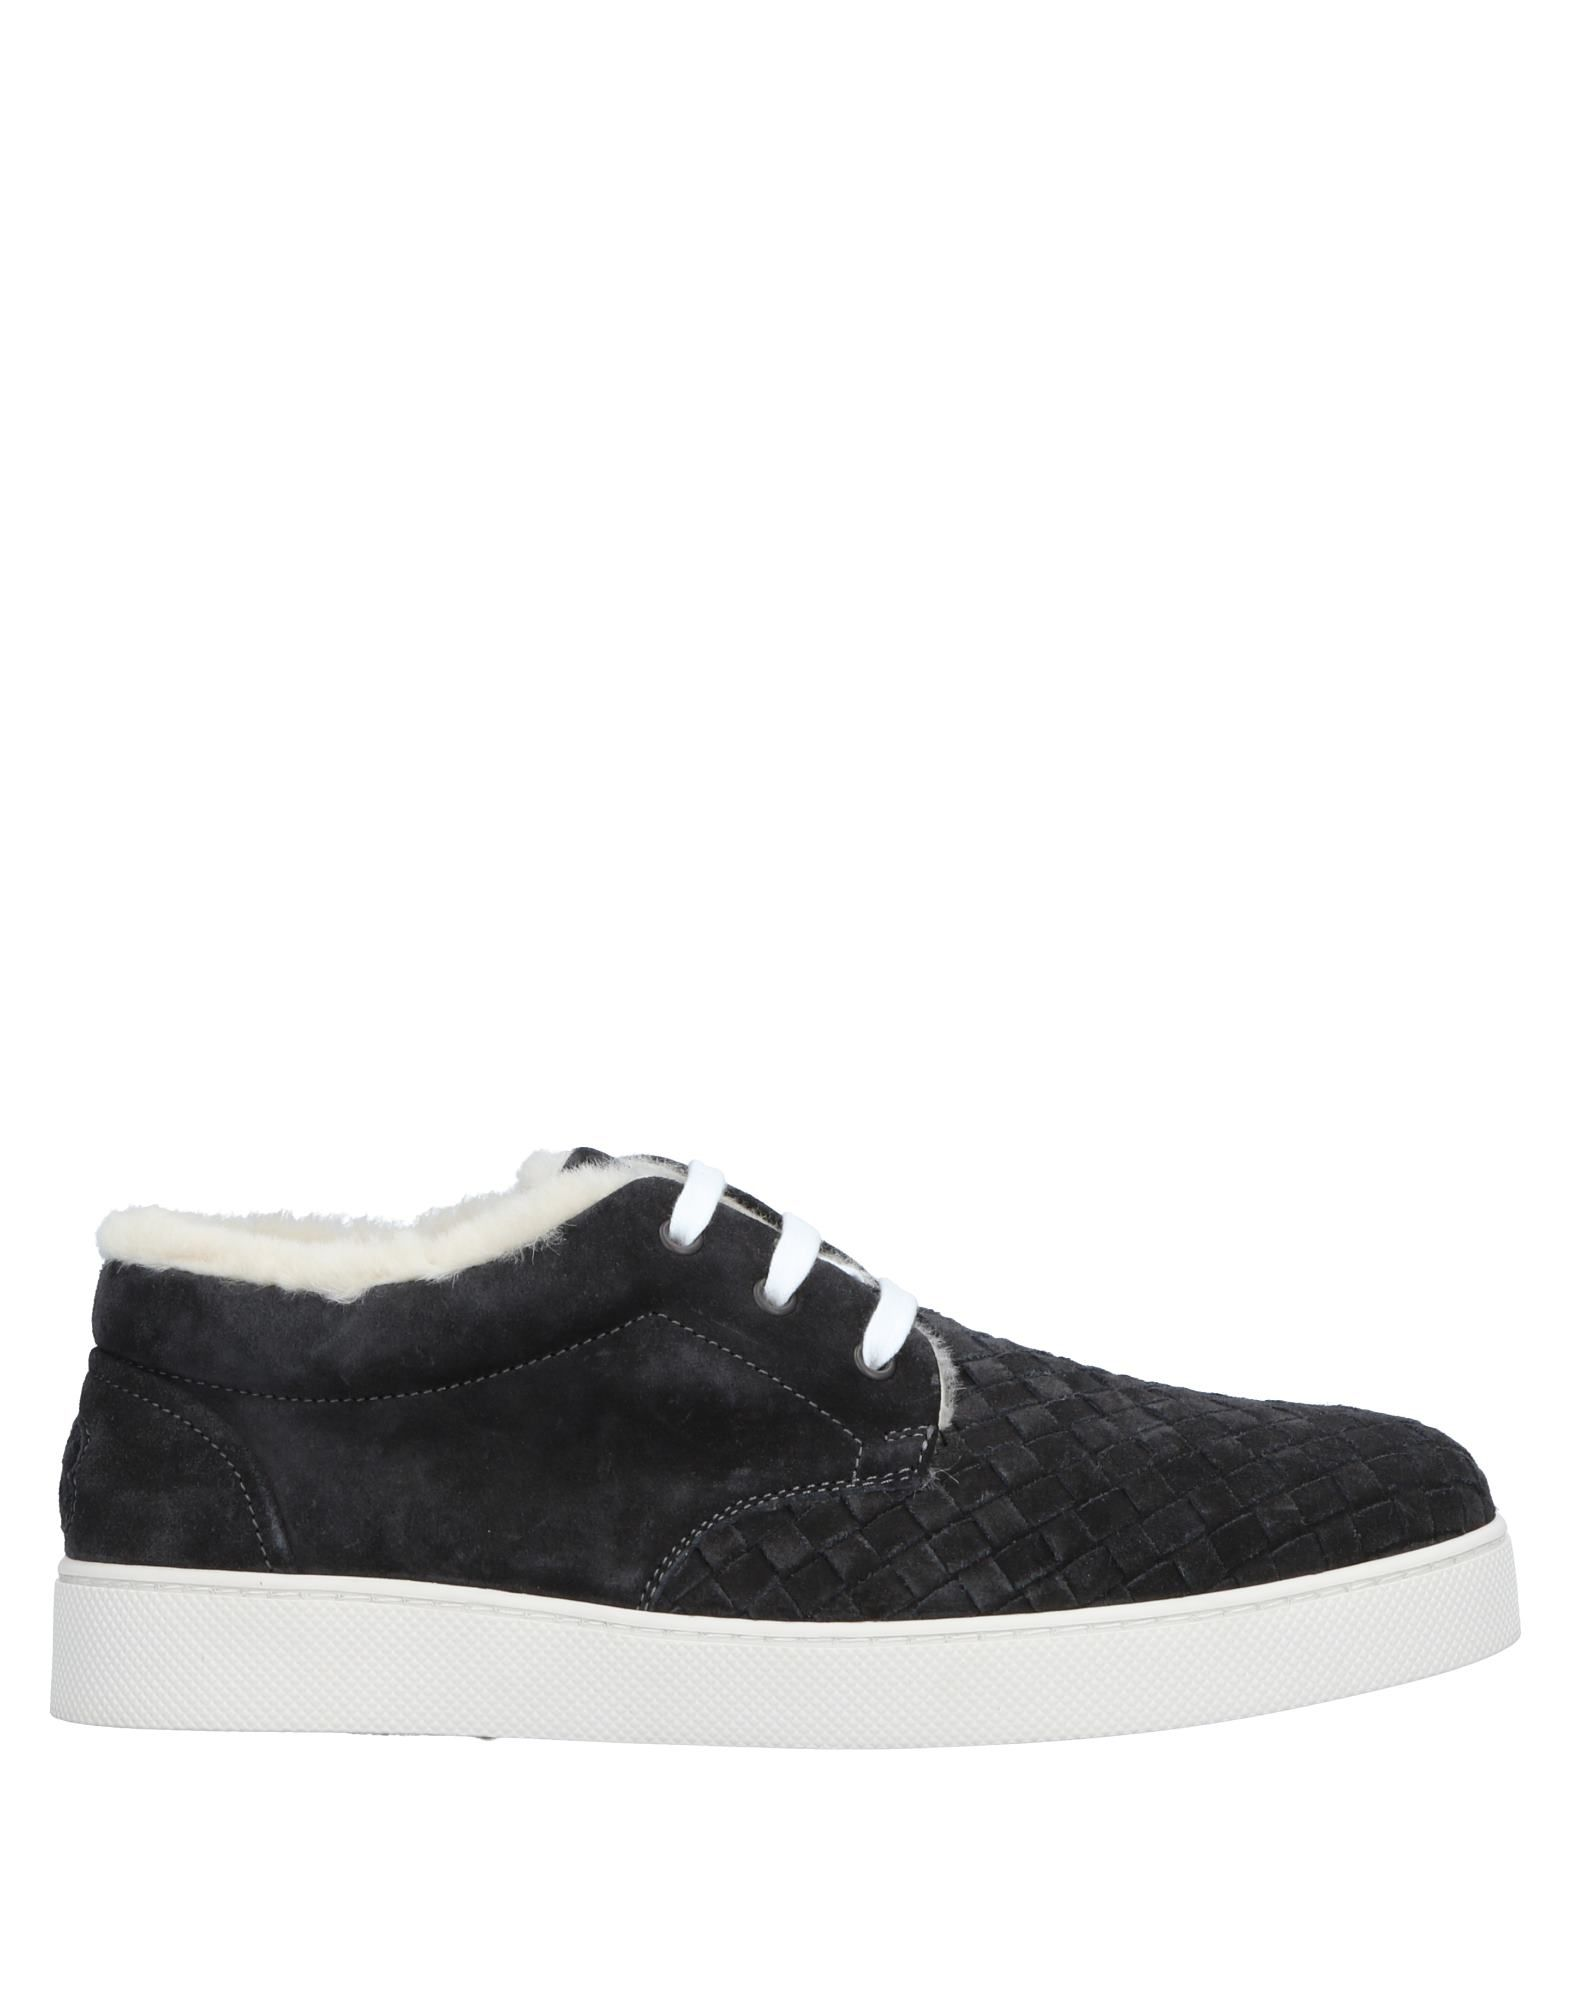 Bottega Veneta Sneakers Herren  11541003NL Gute Qualität beliebte Schuhe